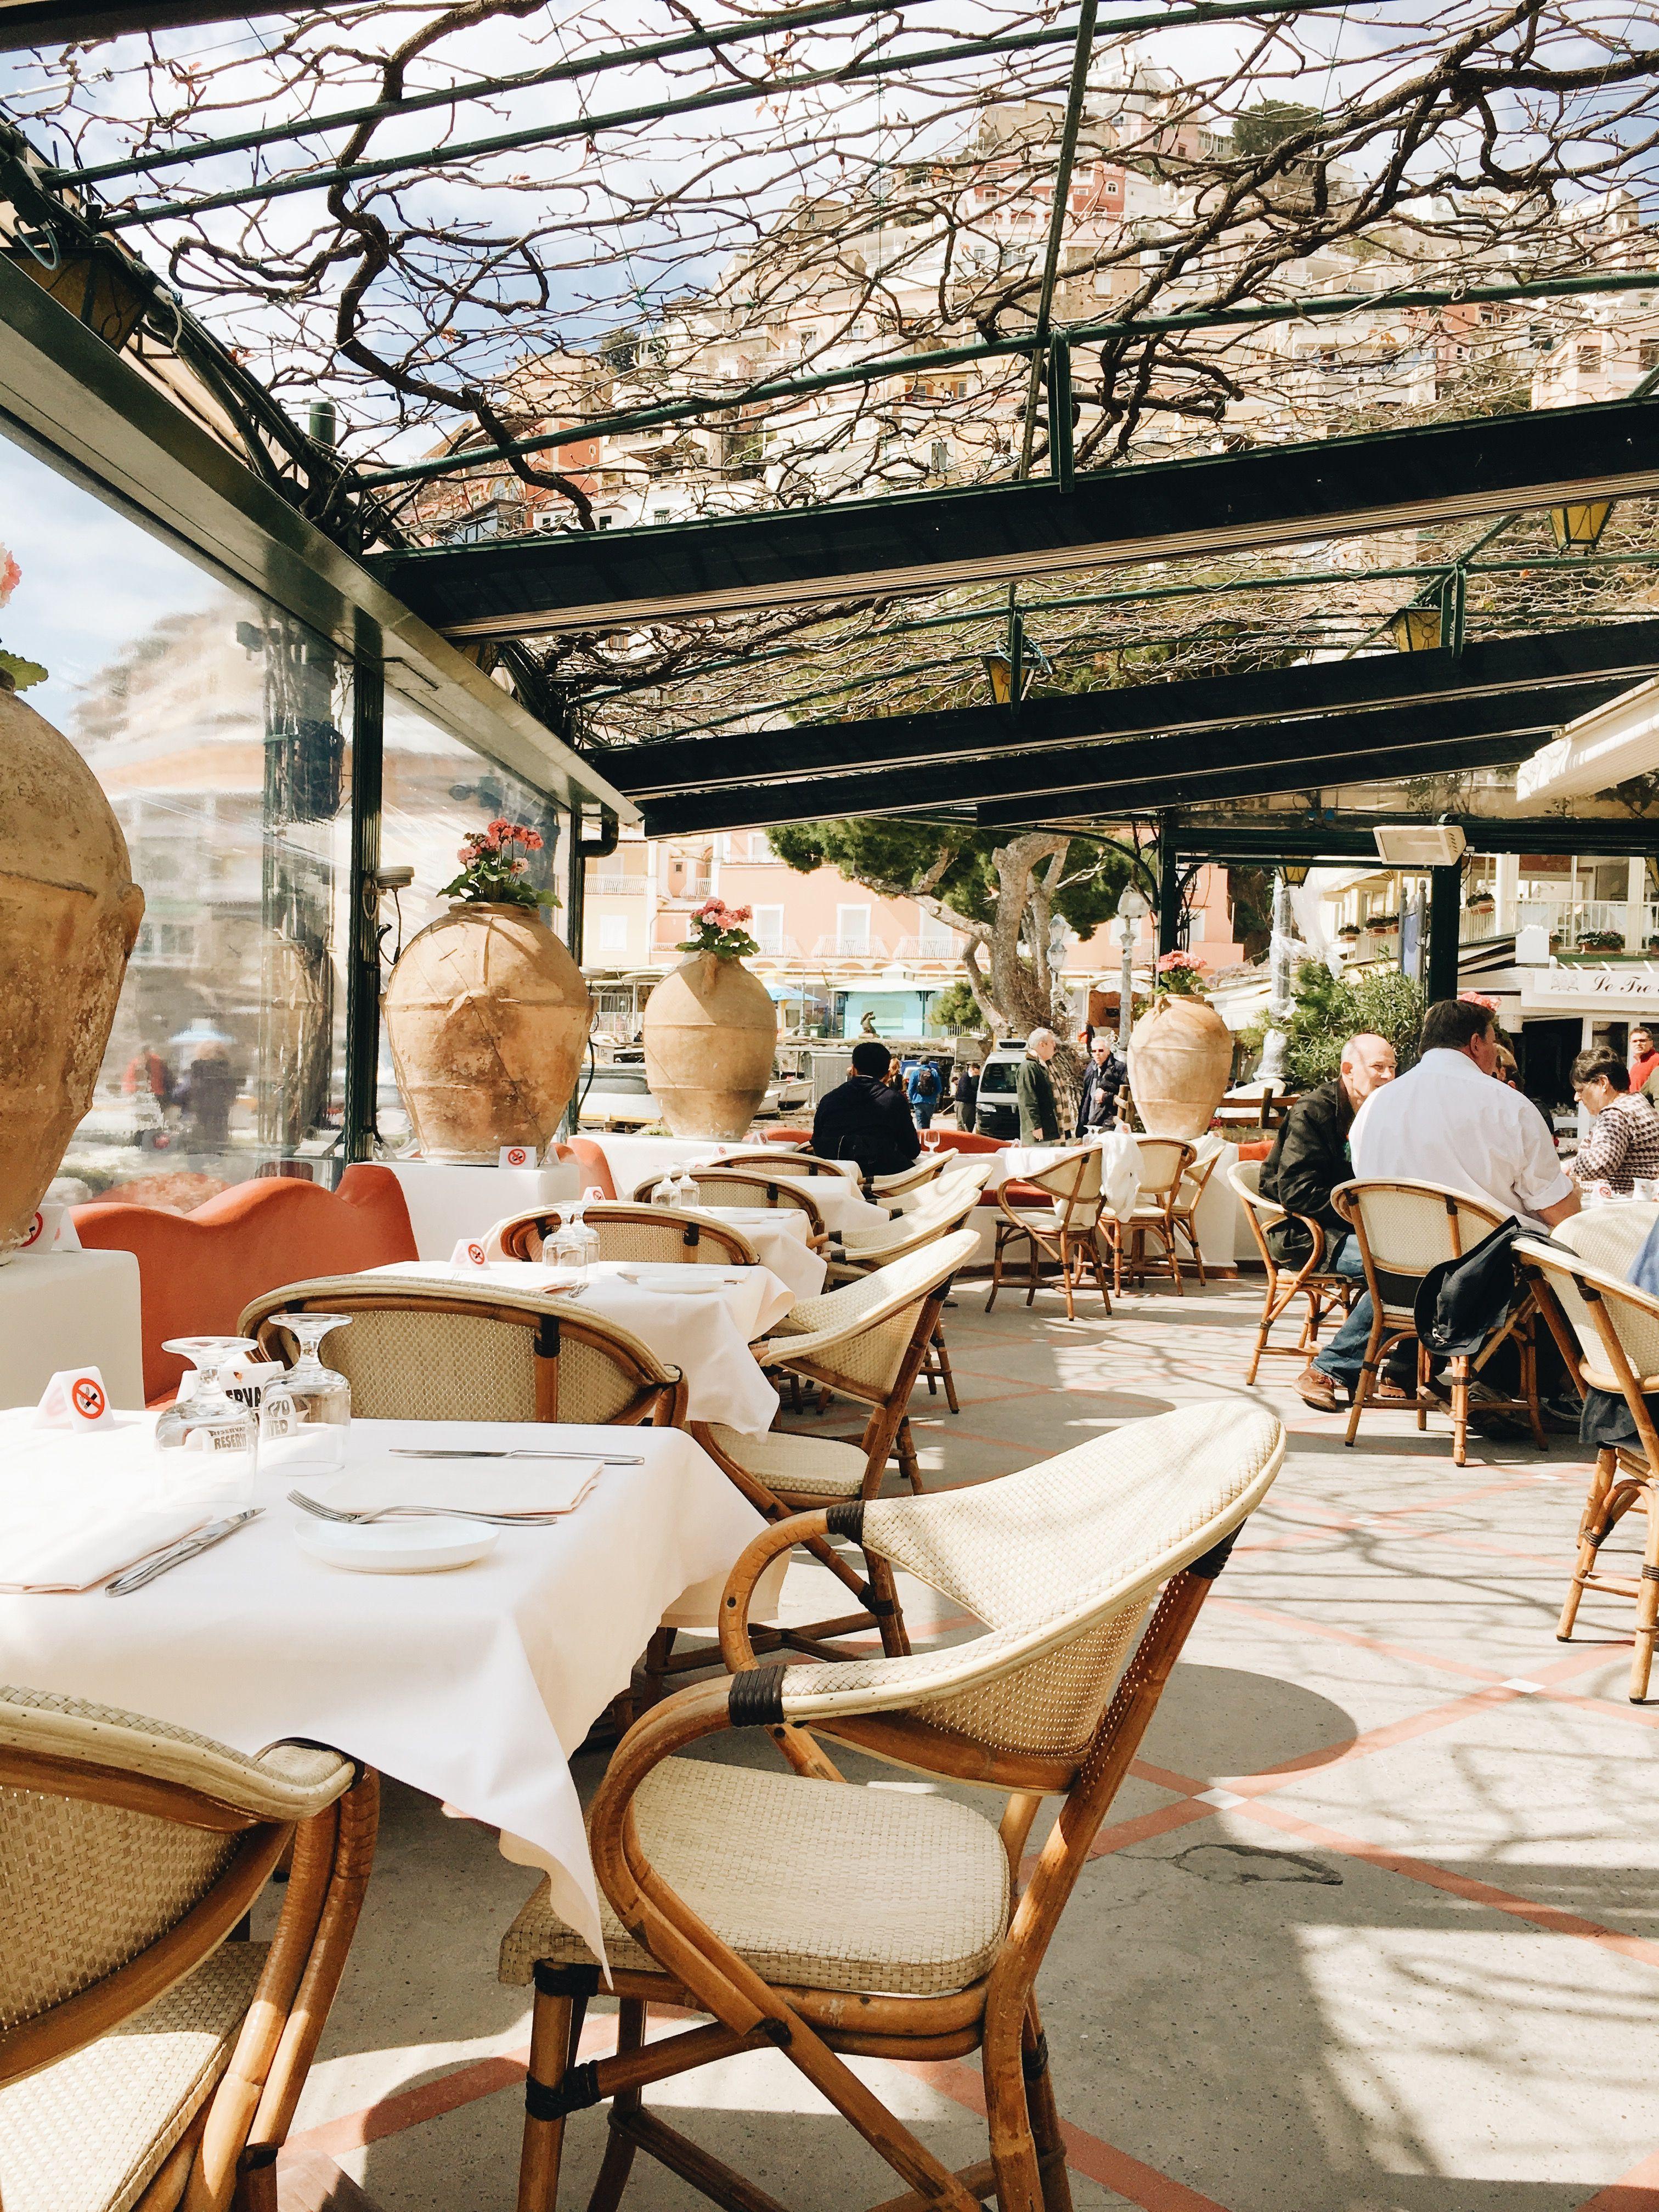 Positano, Italy, ristorante la pergola, Amalfi Coast